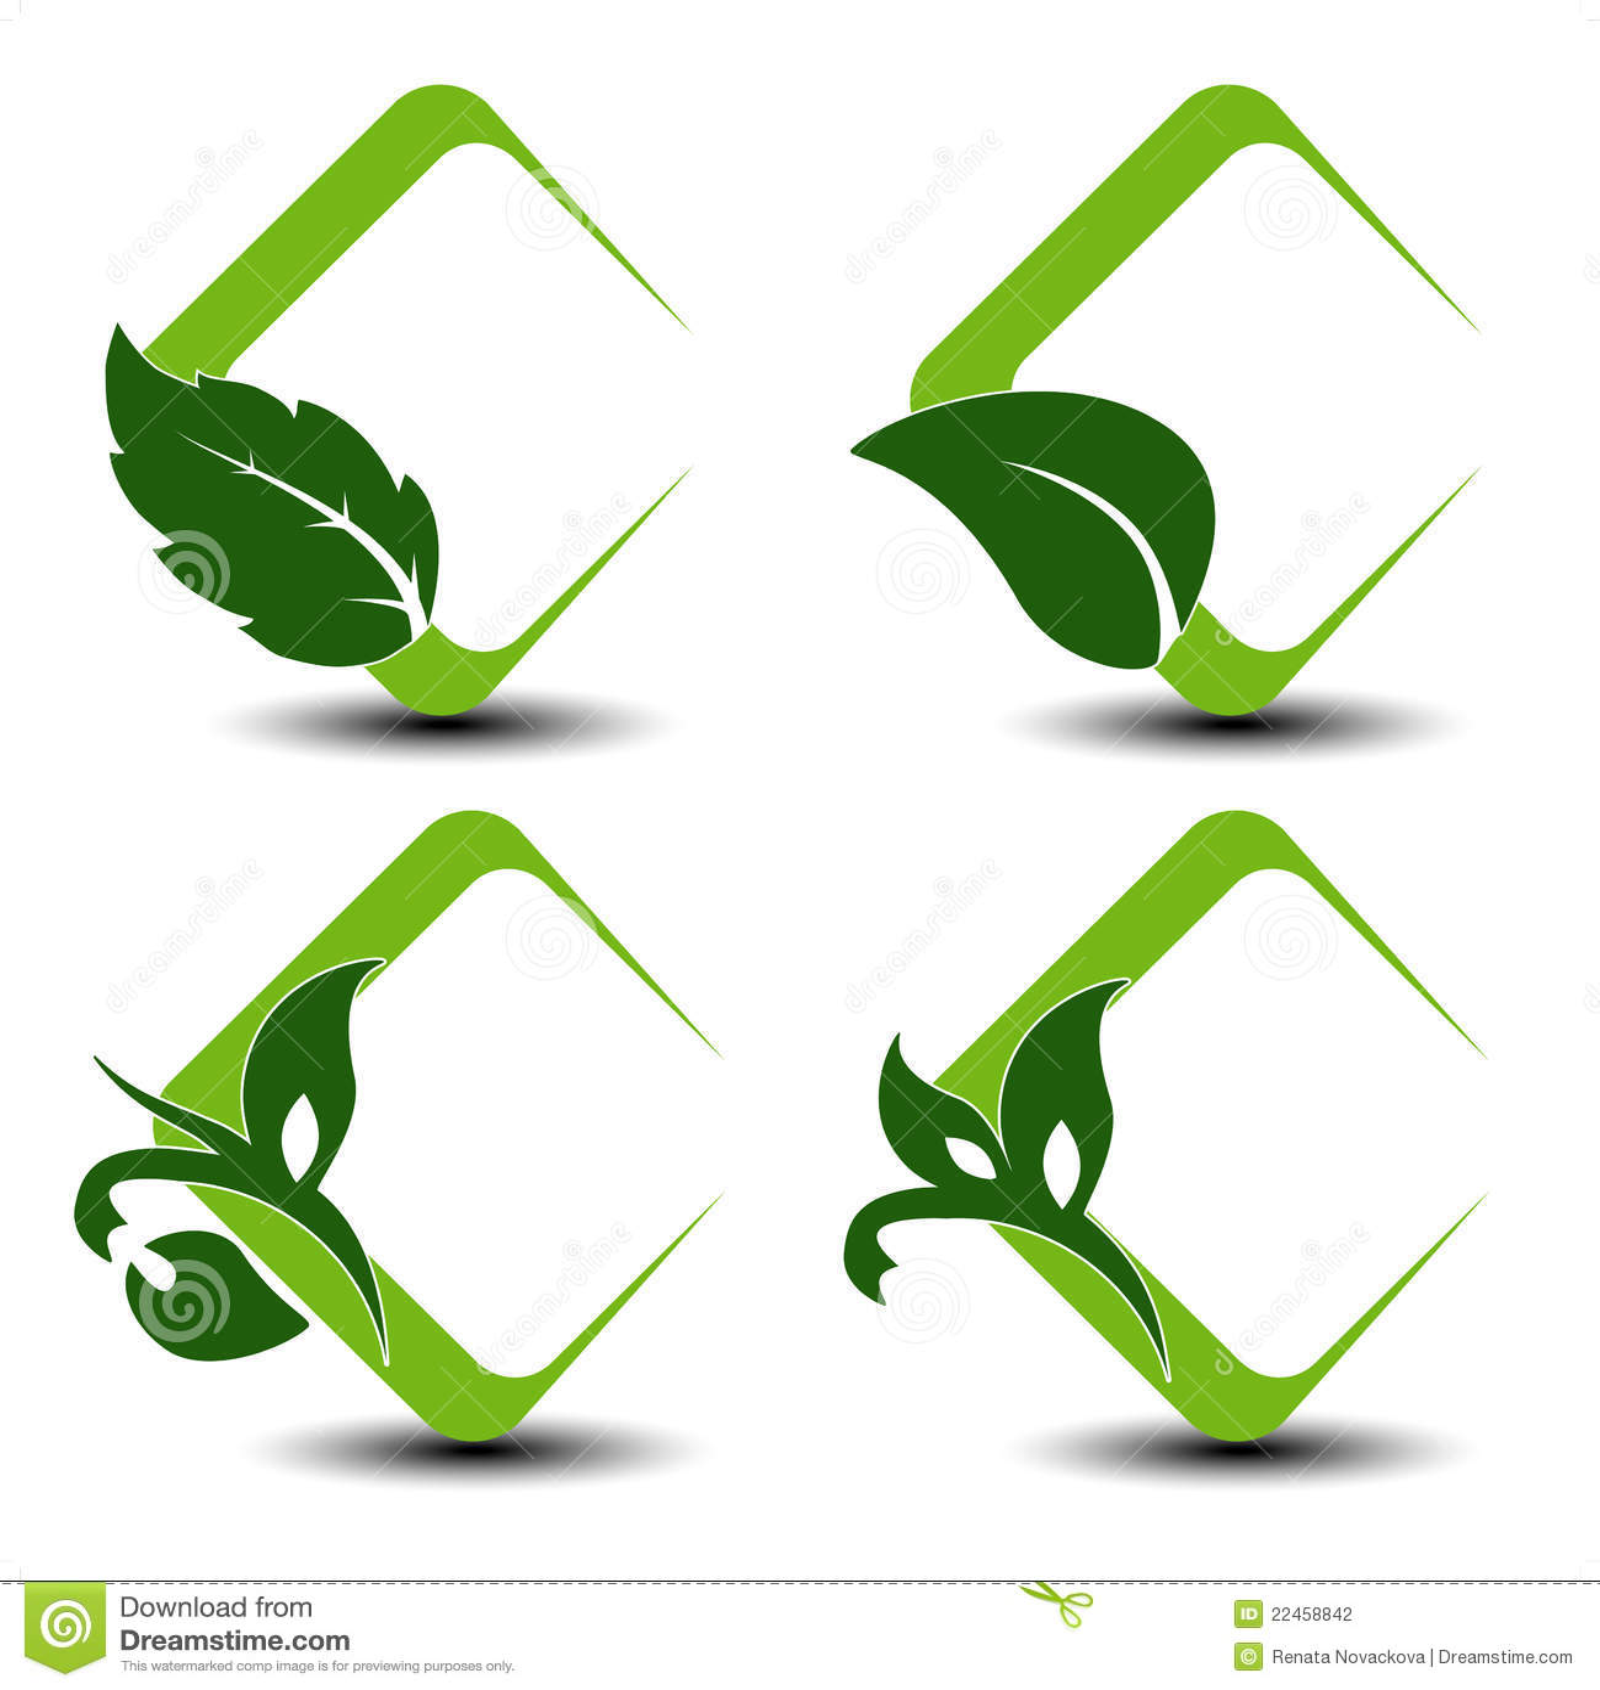 Natural Symbols With Leaf Stock Photography - Image: 22458842 Organic Leaf Symbol